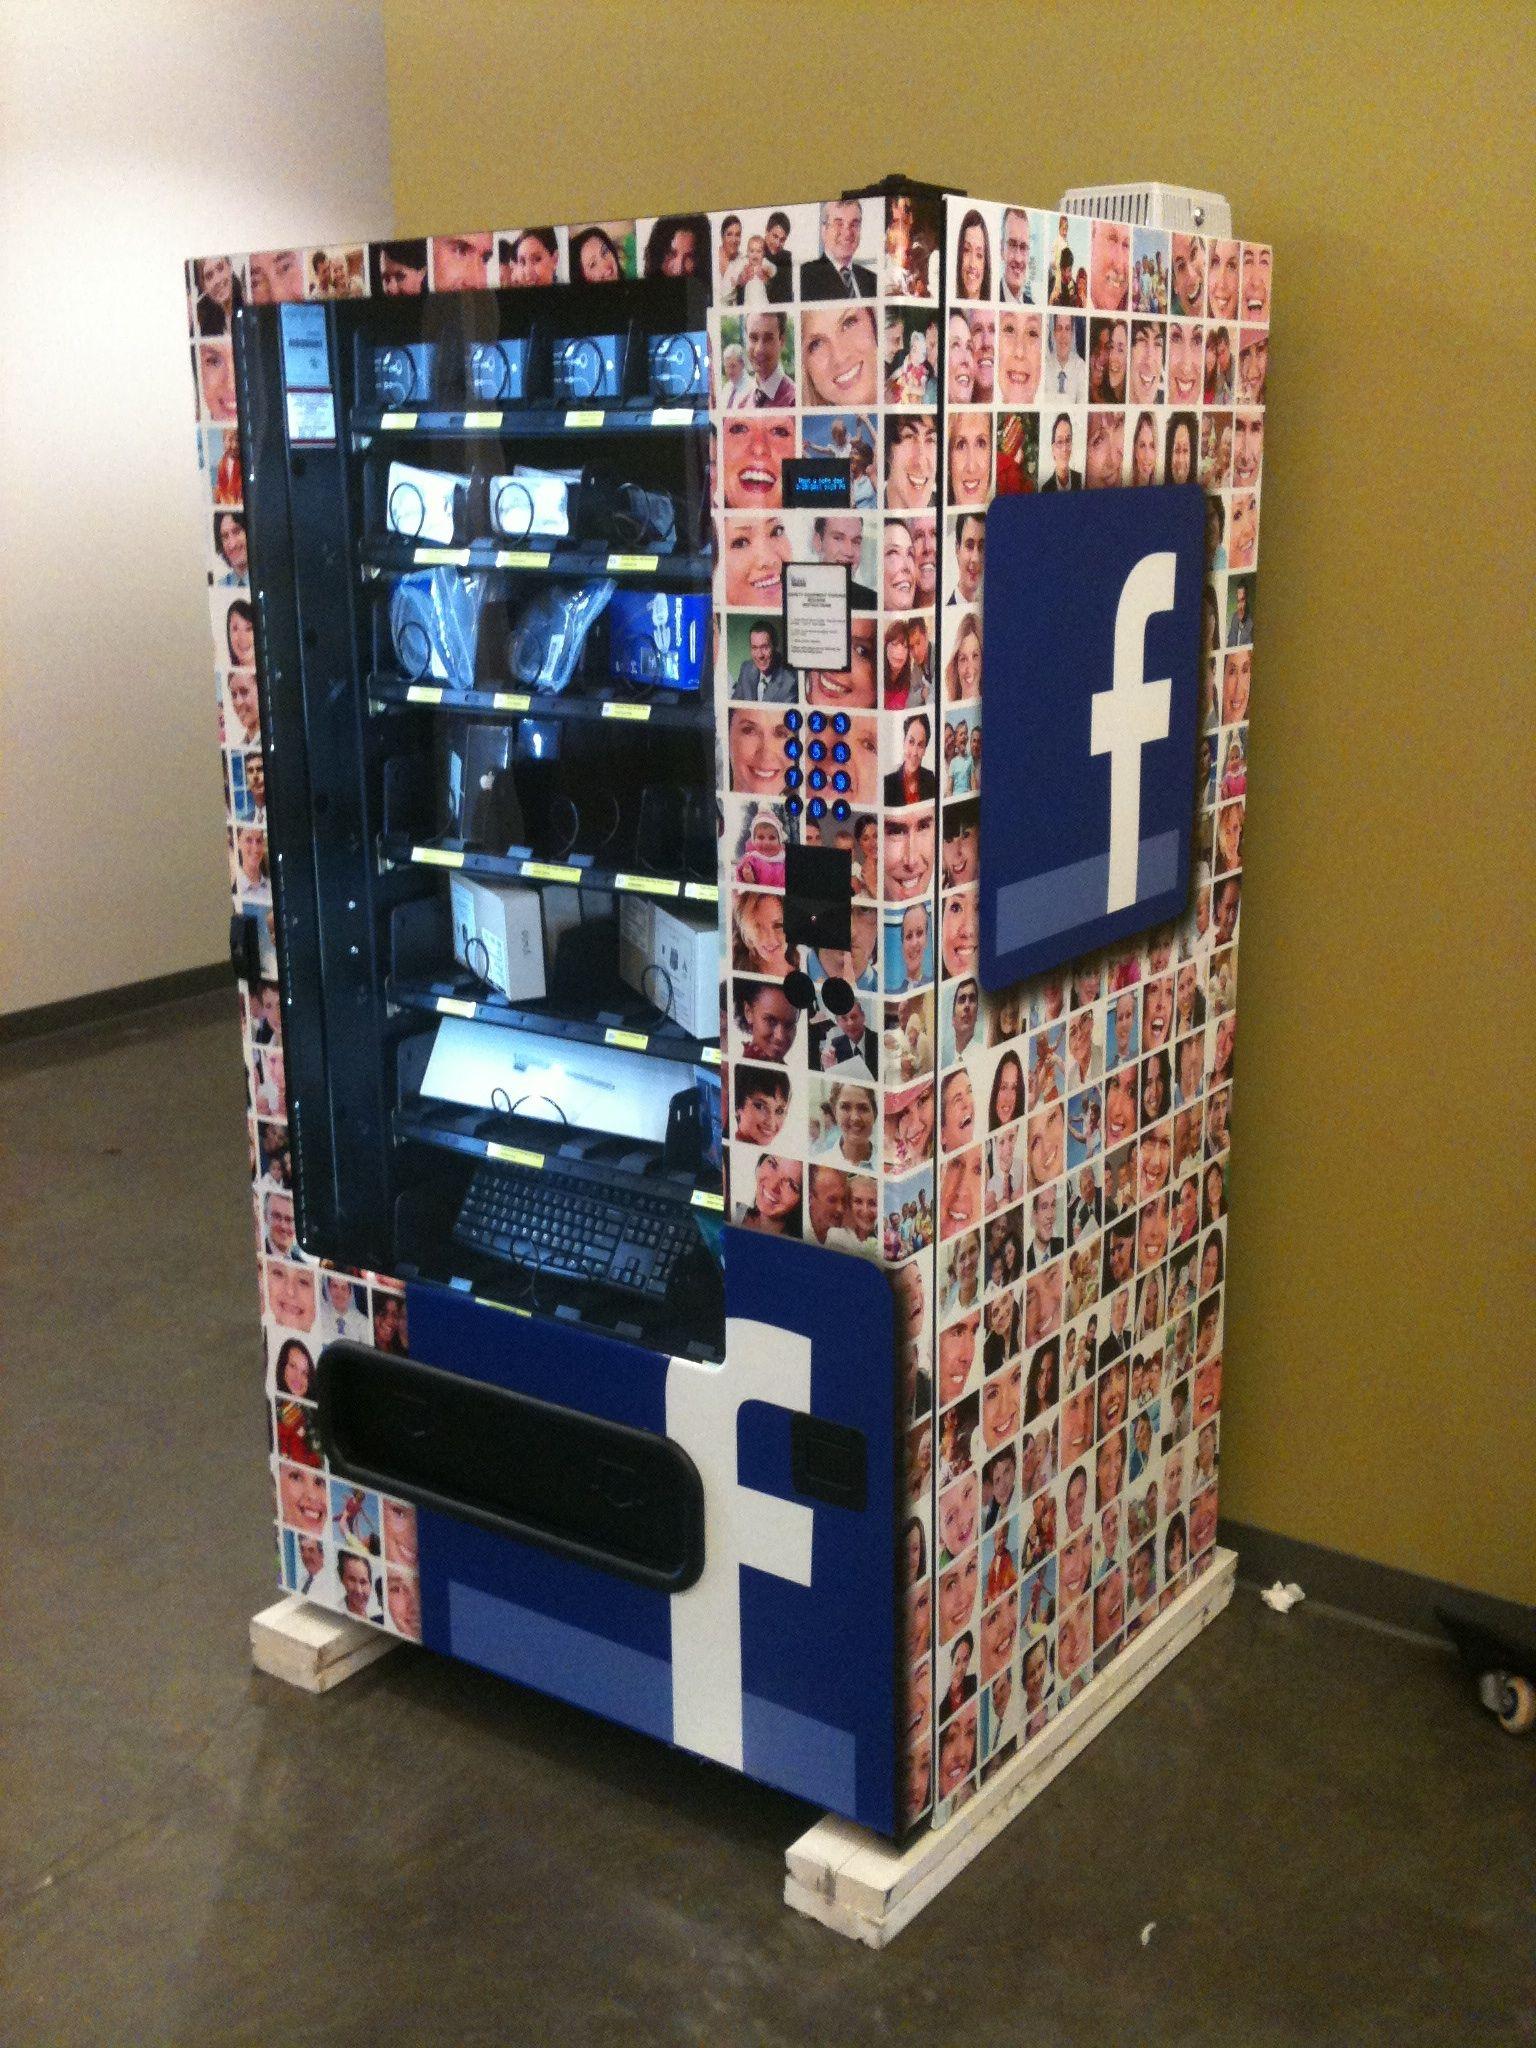 Hair accessories vending machines - Facebook S Vending Machines A Coke Or A Keyboard